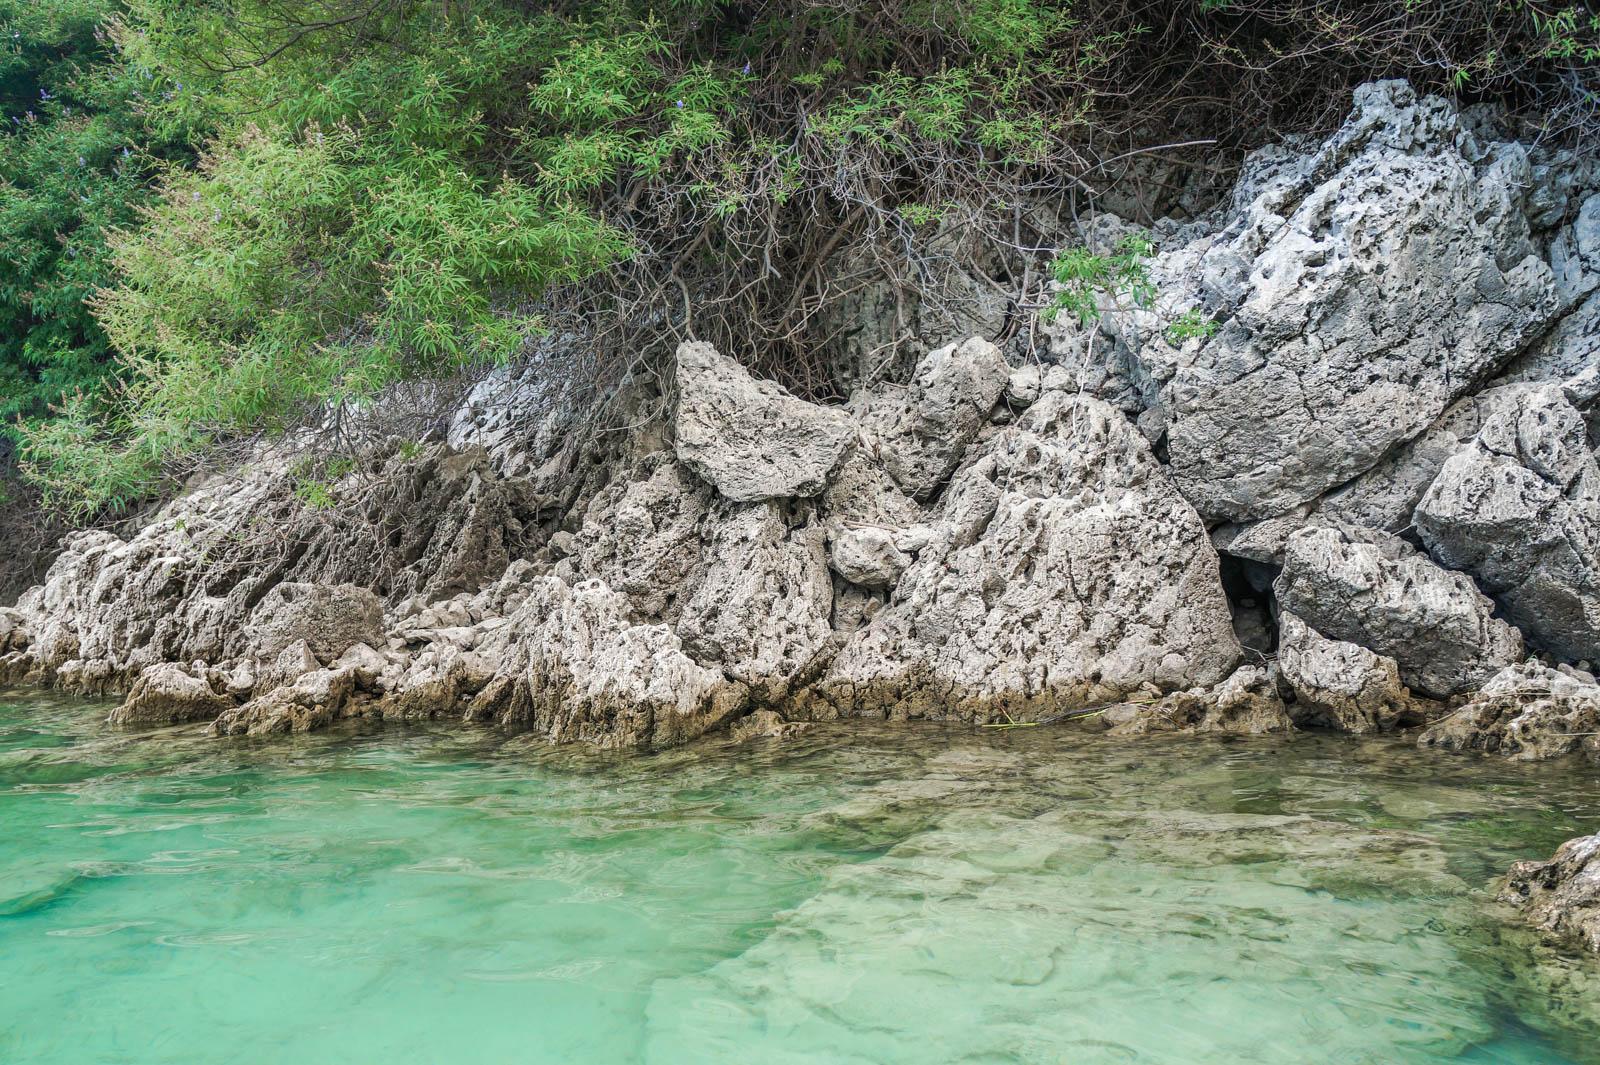 kourna-lake-crete-greece-la-vie-en-blog-all-rights-reserved-9